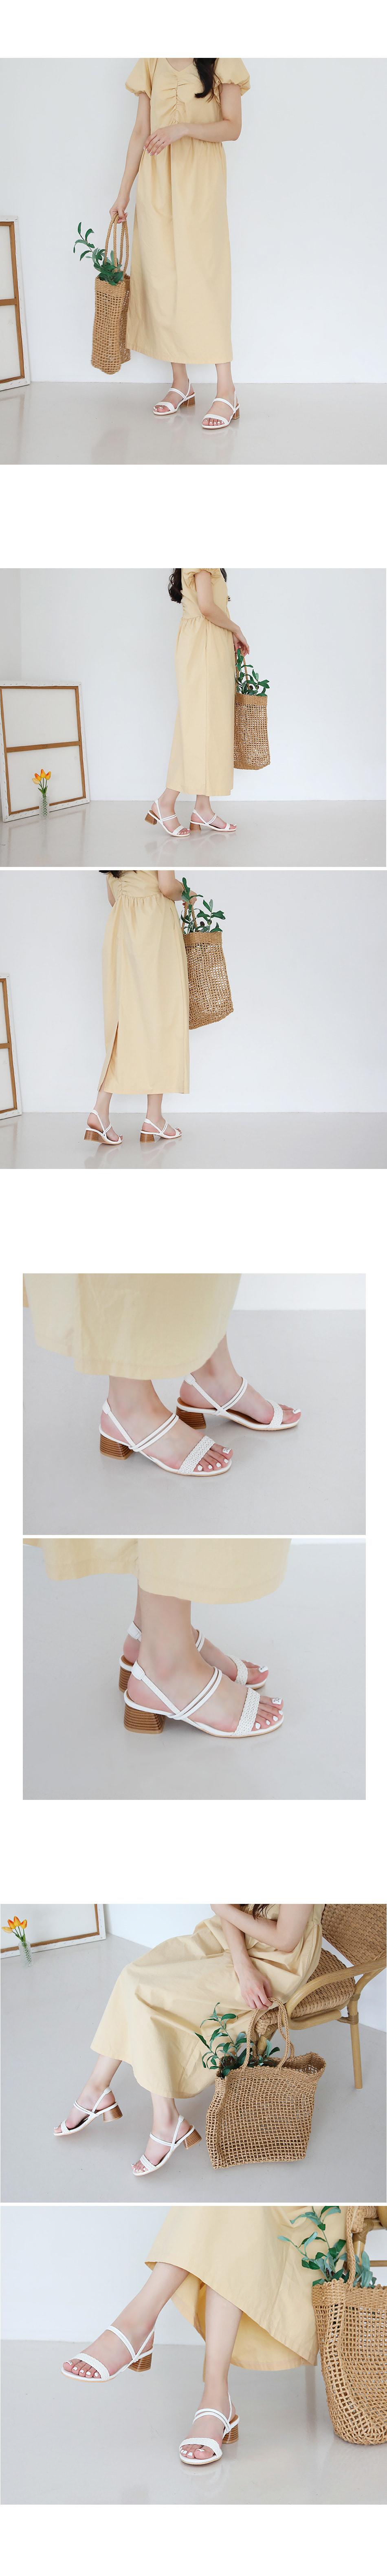 Reptile Slingback Sandals 4cm